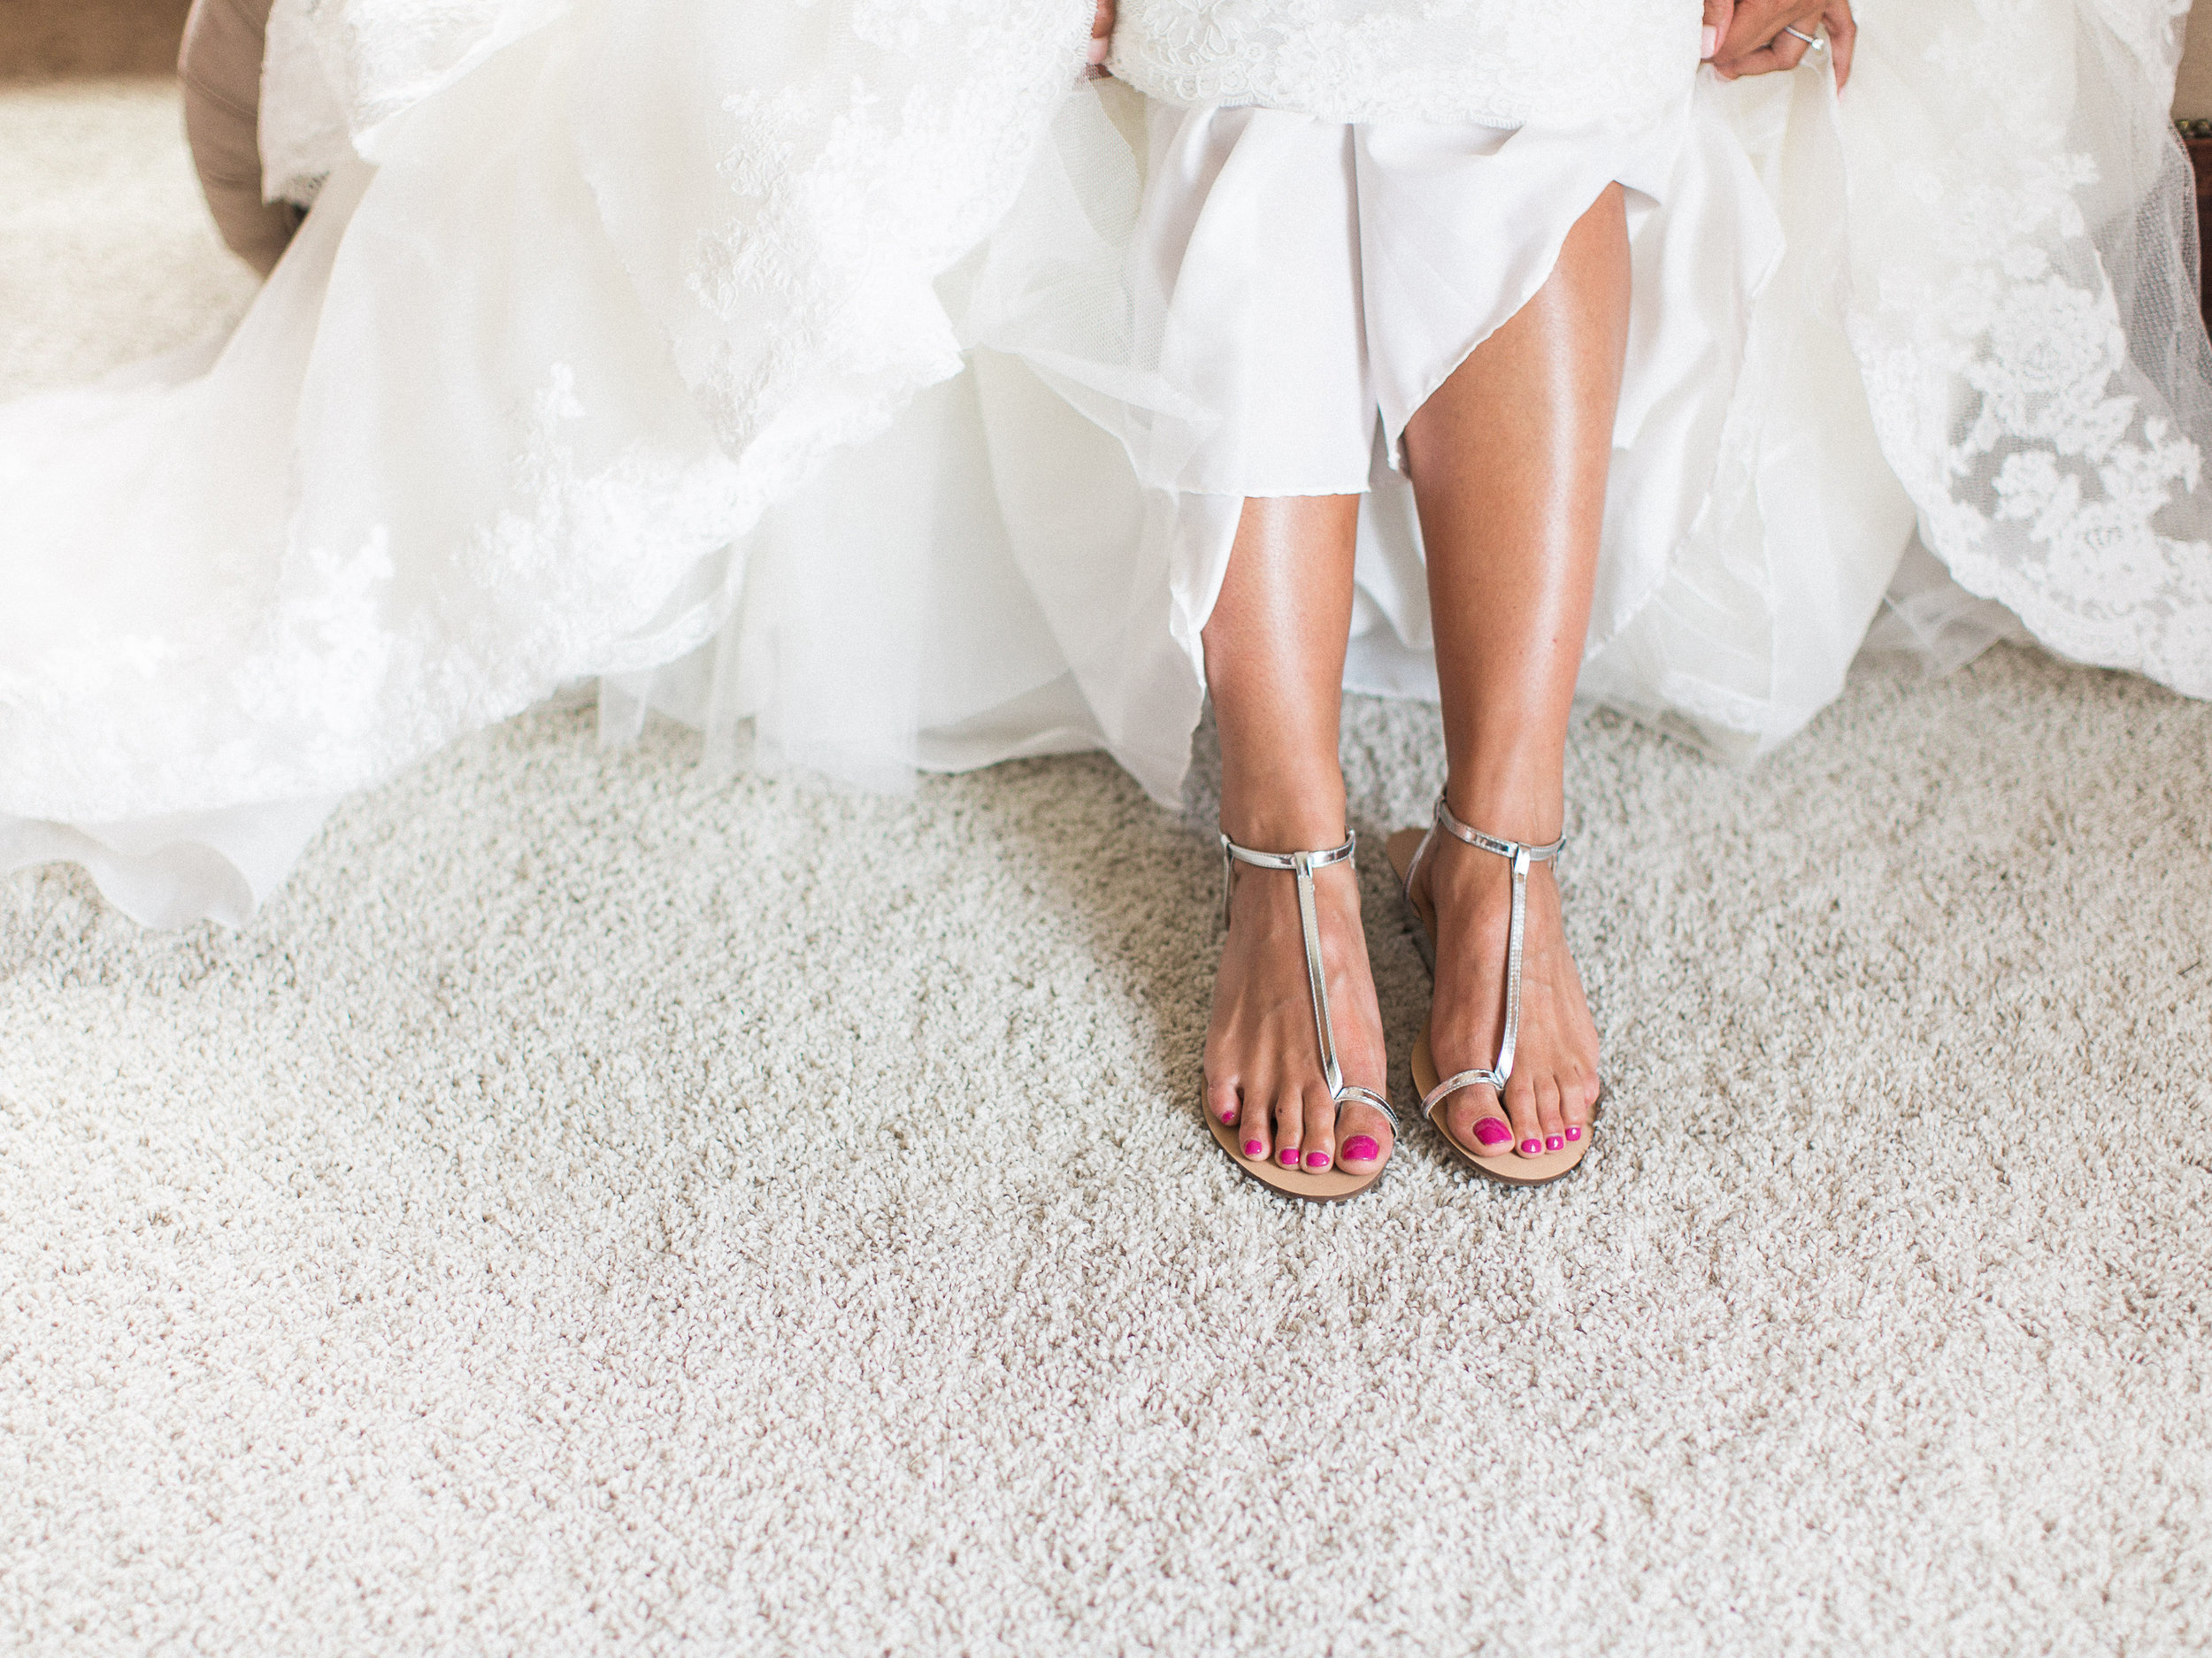 ERIC AND HALLIE WEDDING-HI RESOLUTION FOR PRINTING-0184.jpg